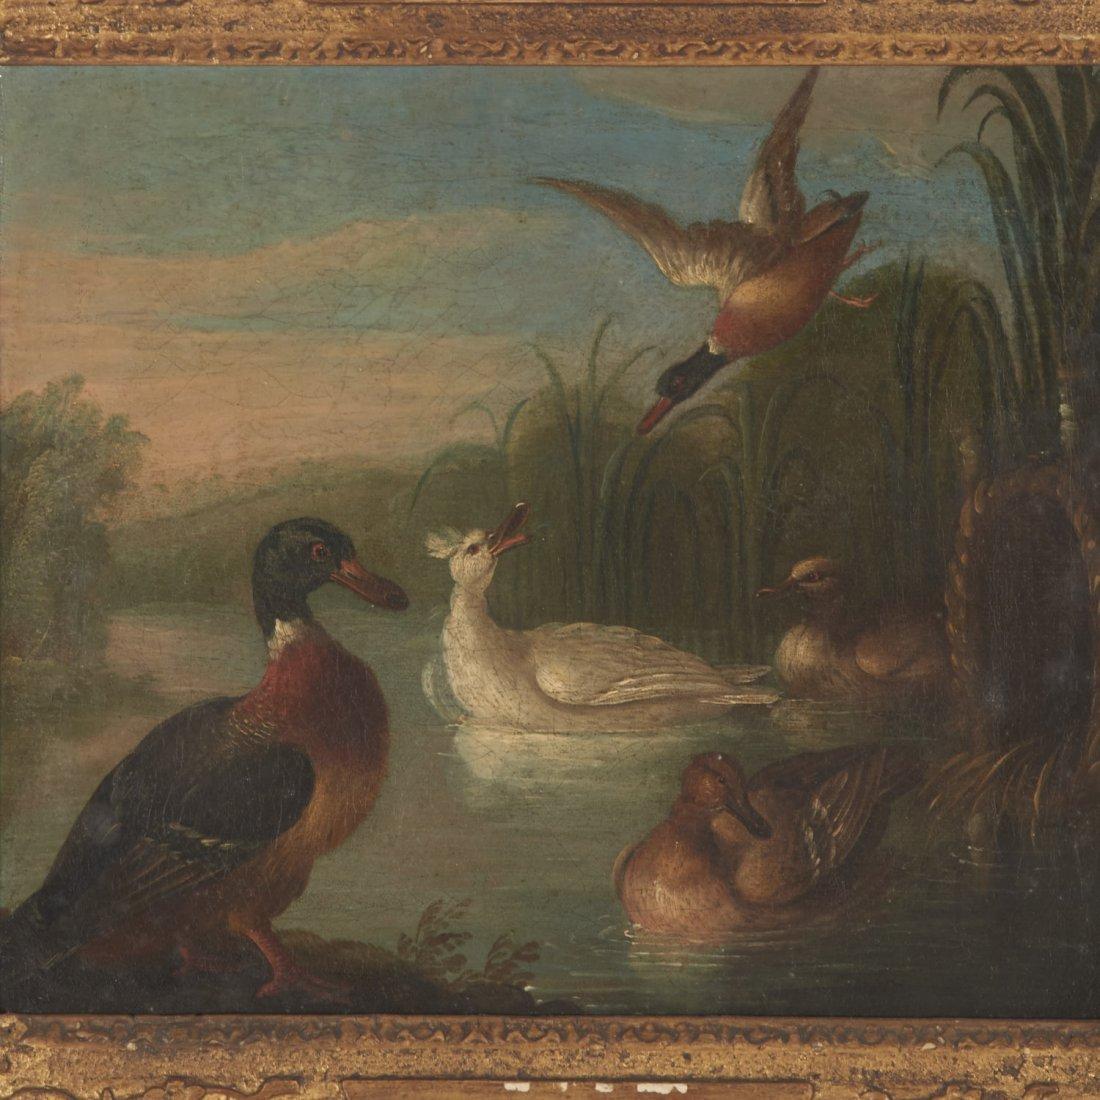 Marmaduke Cradock, painting - 2